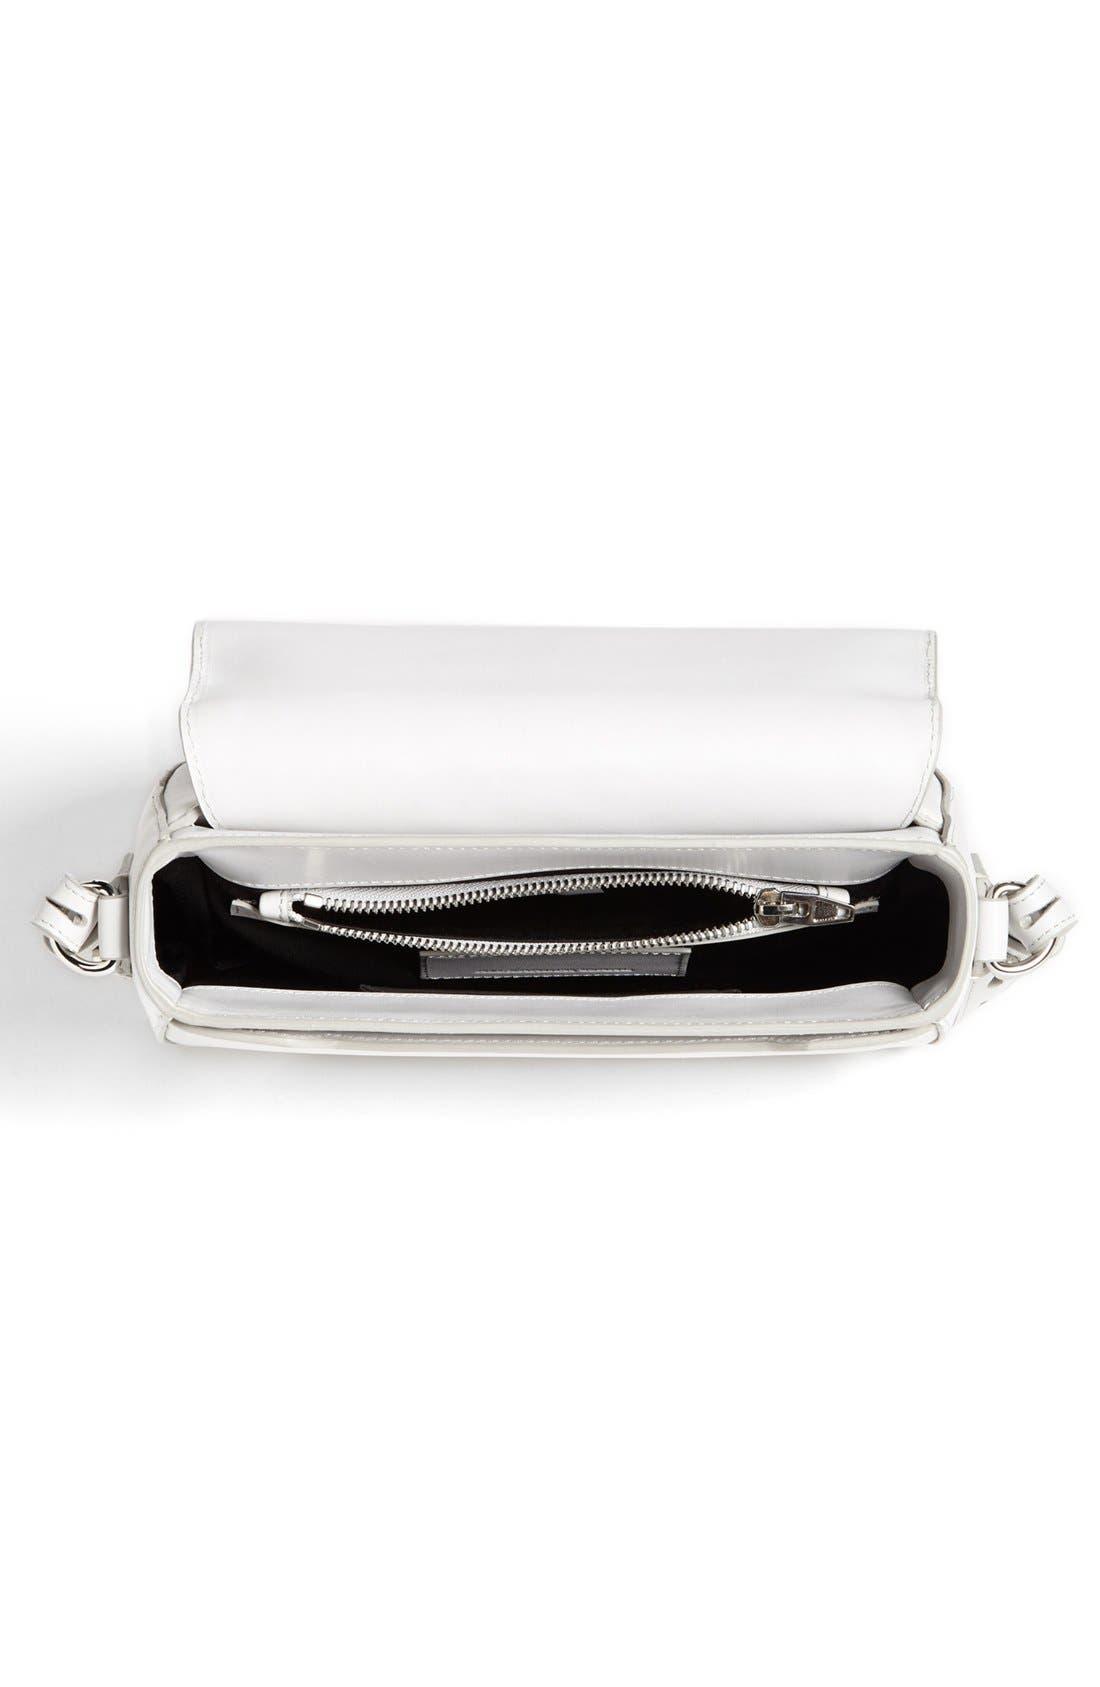 Alternate Image 3  - Alexander Wang 'Lia Stingray - Small' Leather Crossbody Bag